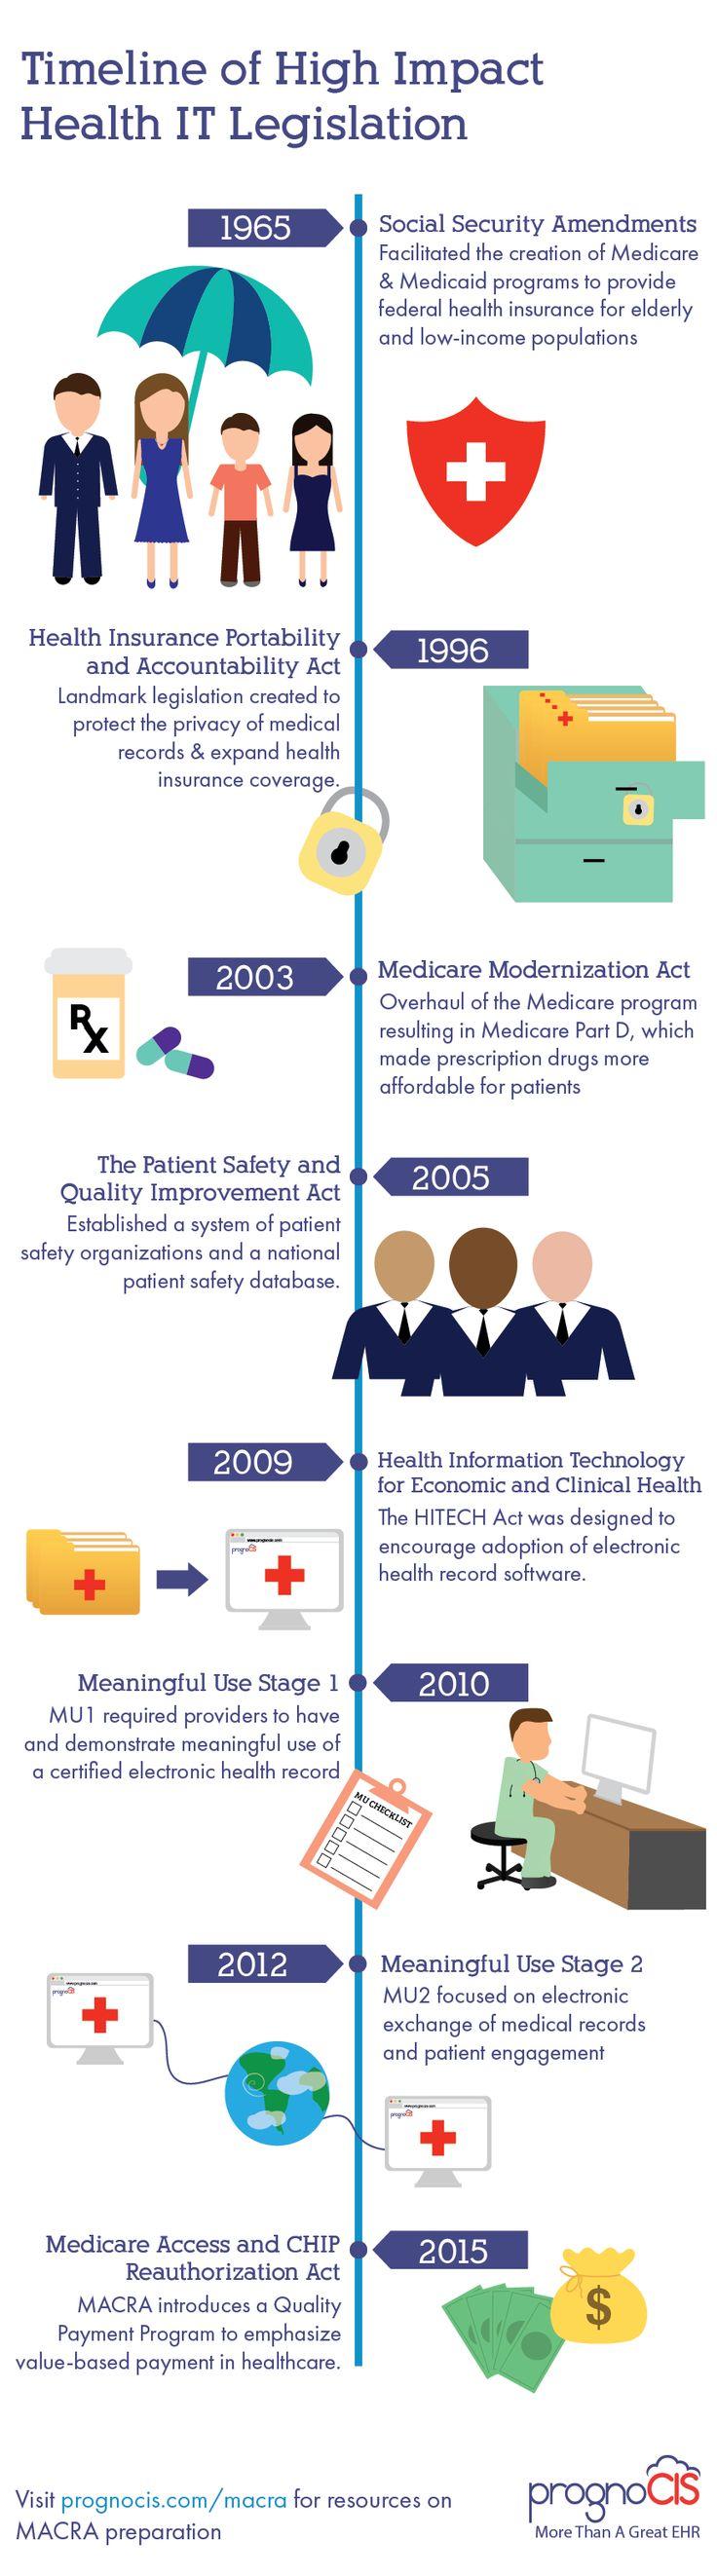 High Impact Health IT Legislation Timeline Electronic